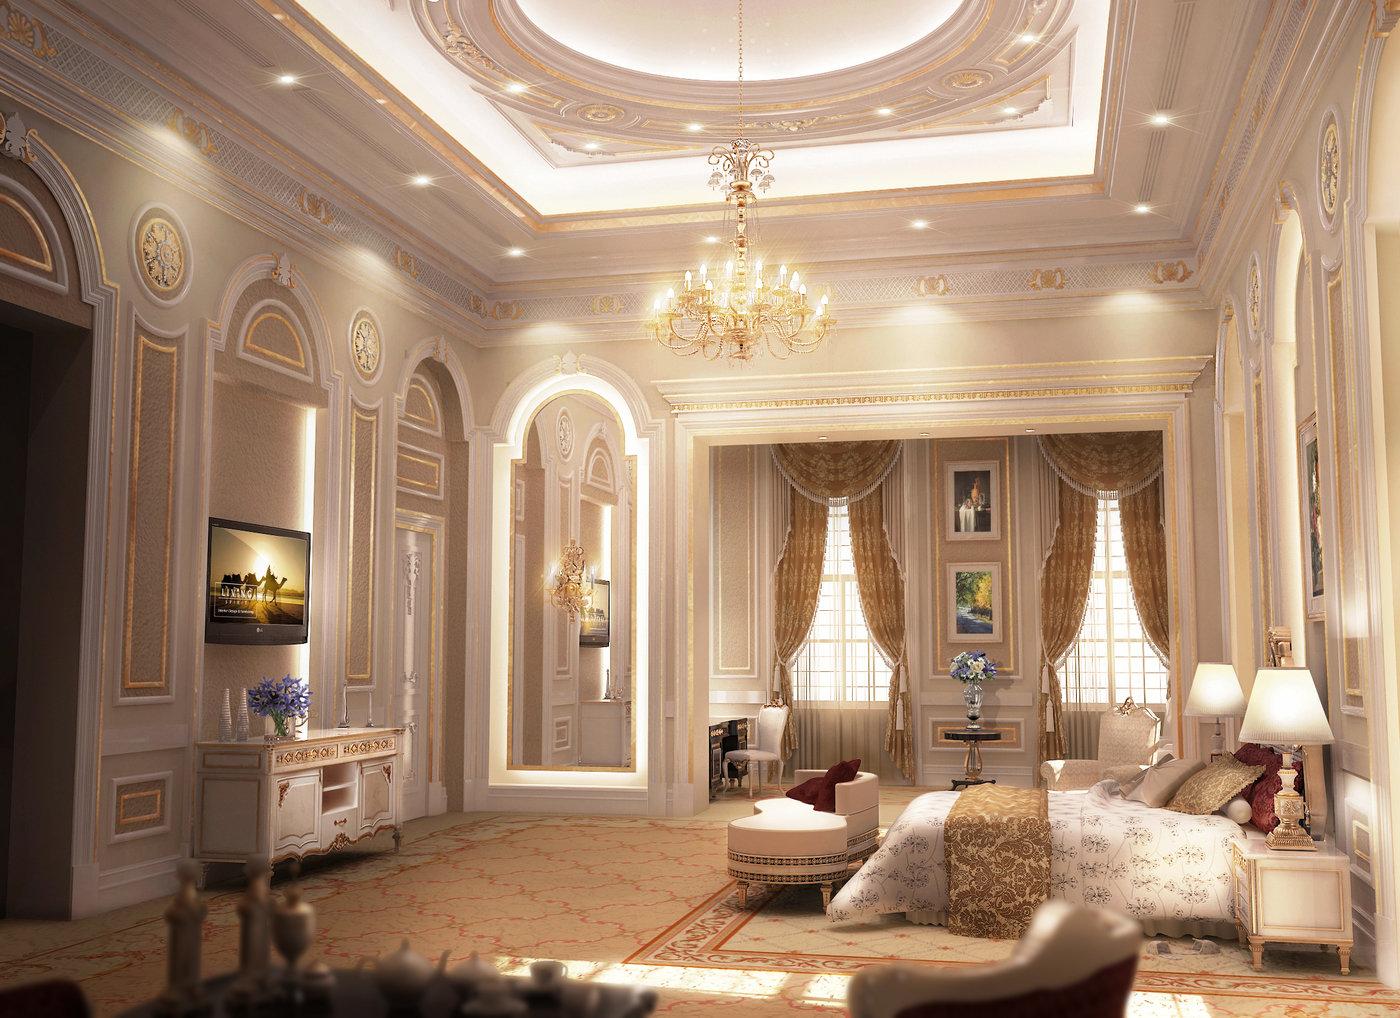 High End Interior Design Concepts By Art Jojo Liban At Coroflot Com